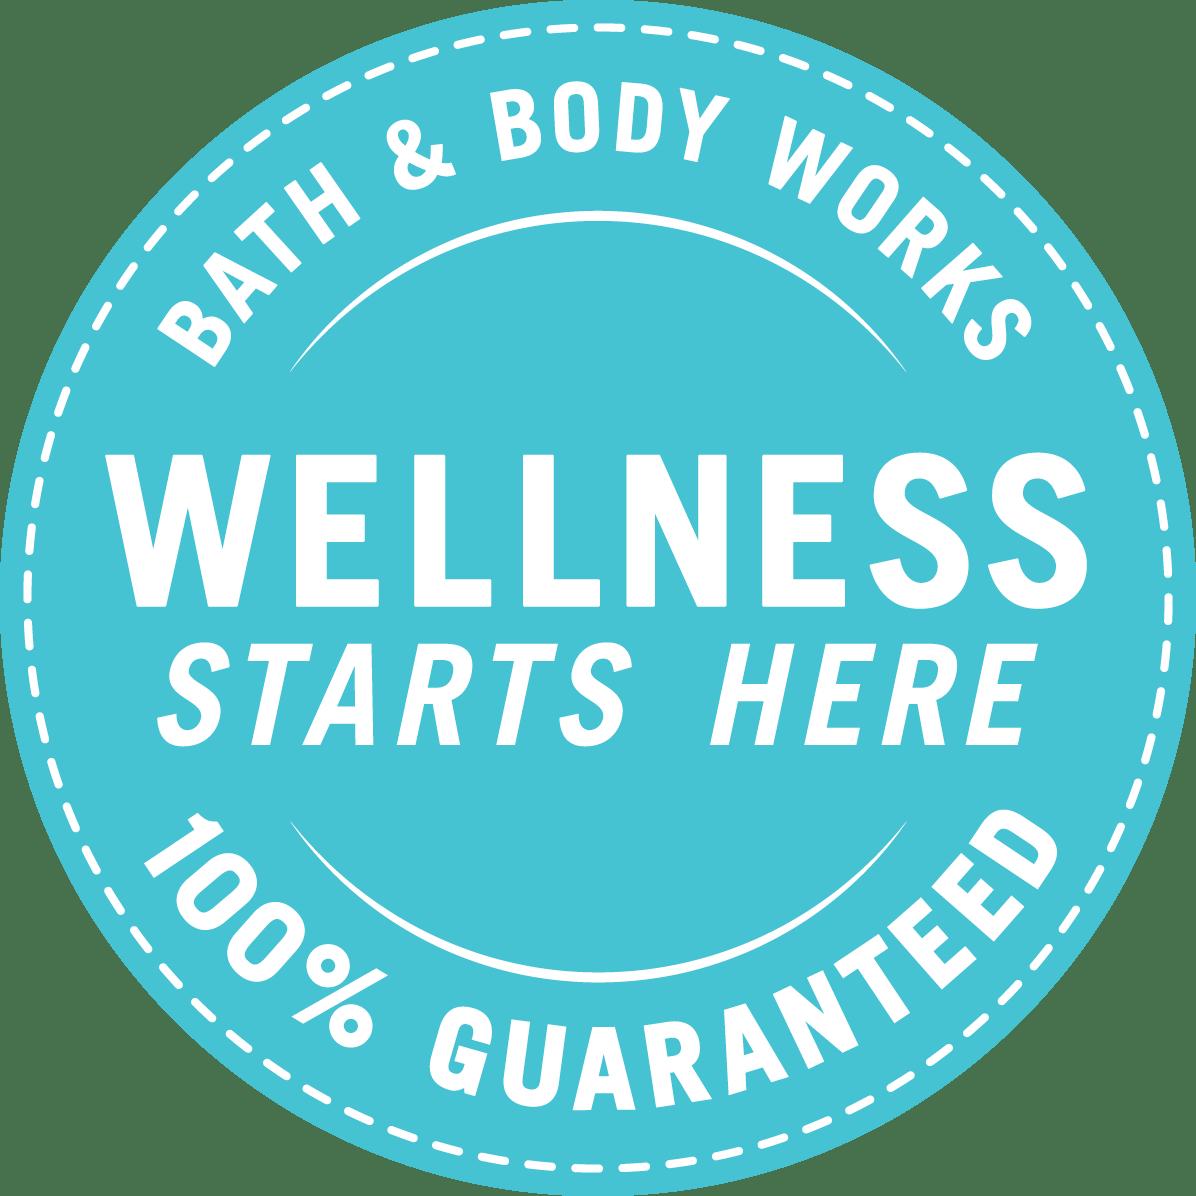 Bath & Body Works. Wellness Starts Here. 100% Guaranteed